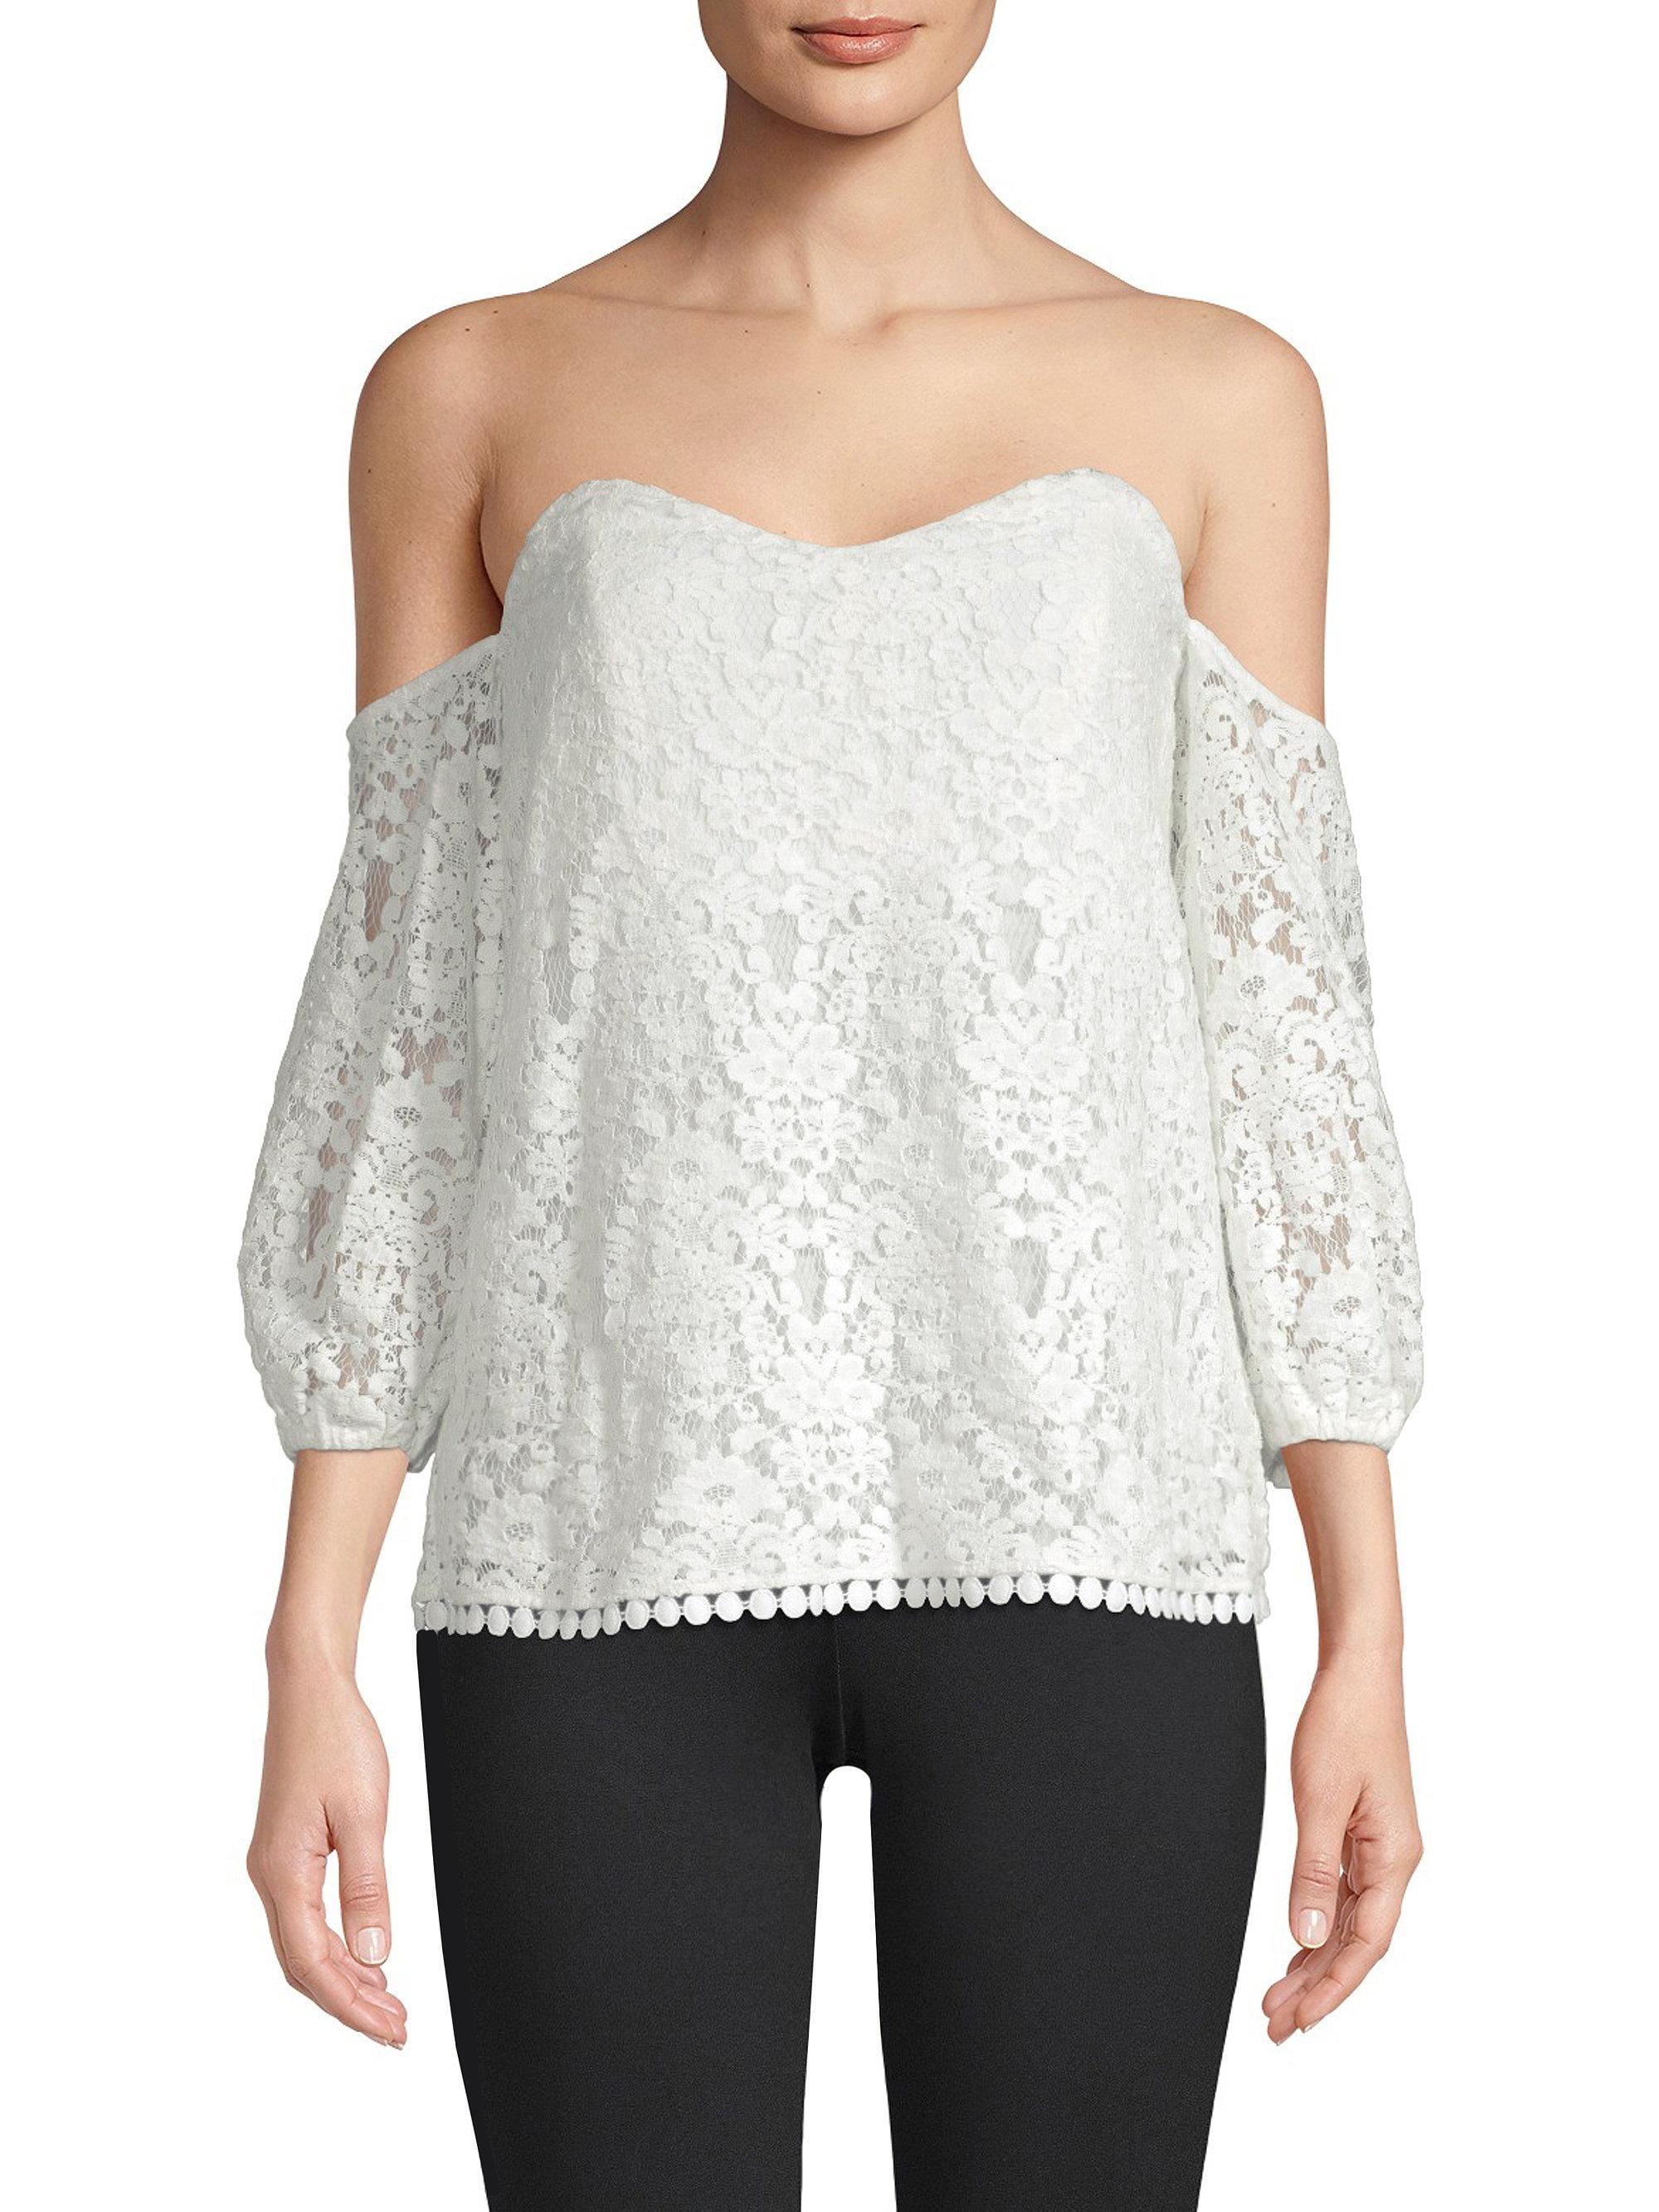 4a588d735c6c2 Lyst - Bailey 44 Crochet Lace Off-the-shoudler Top